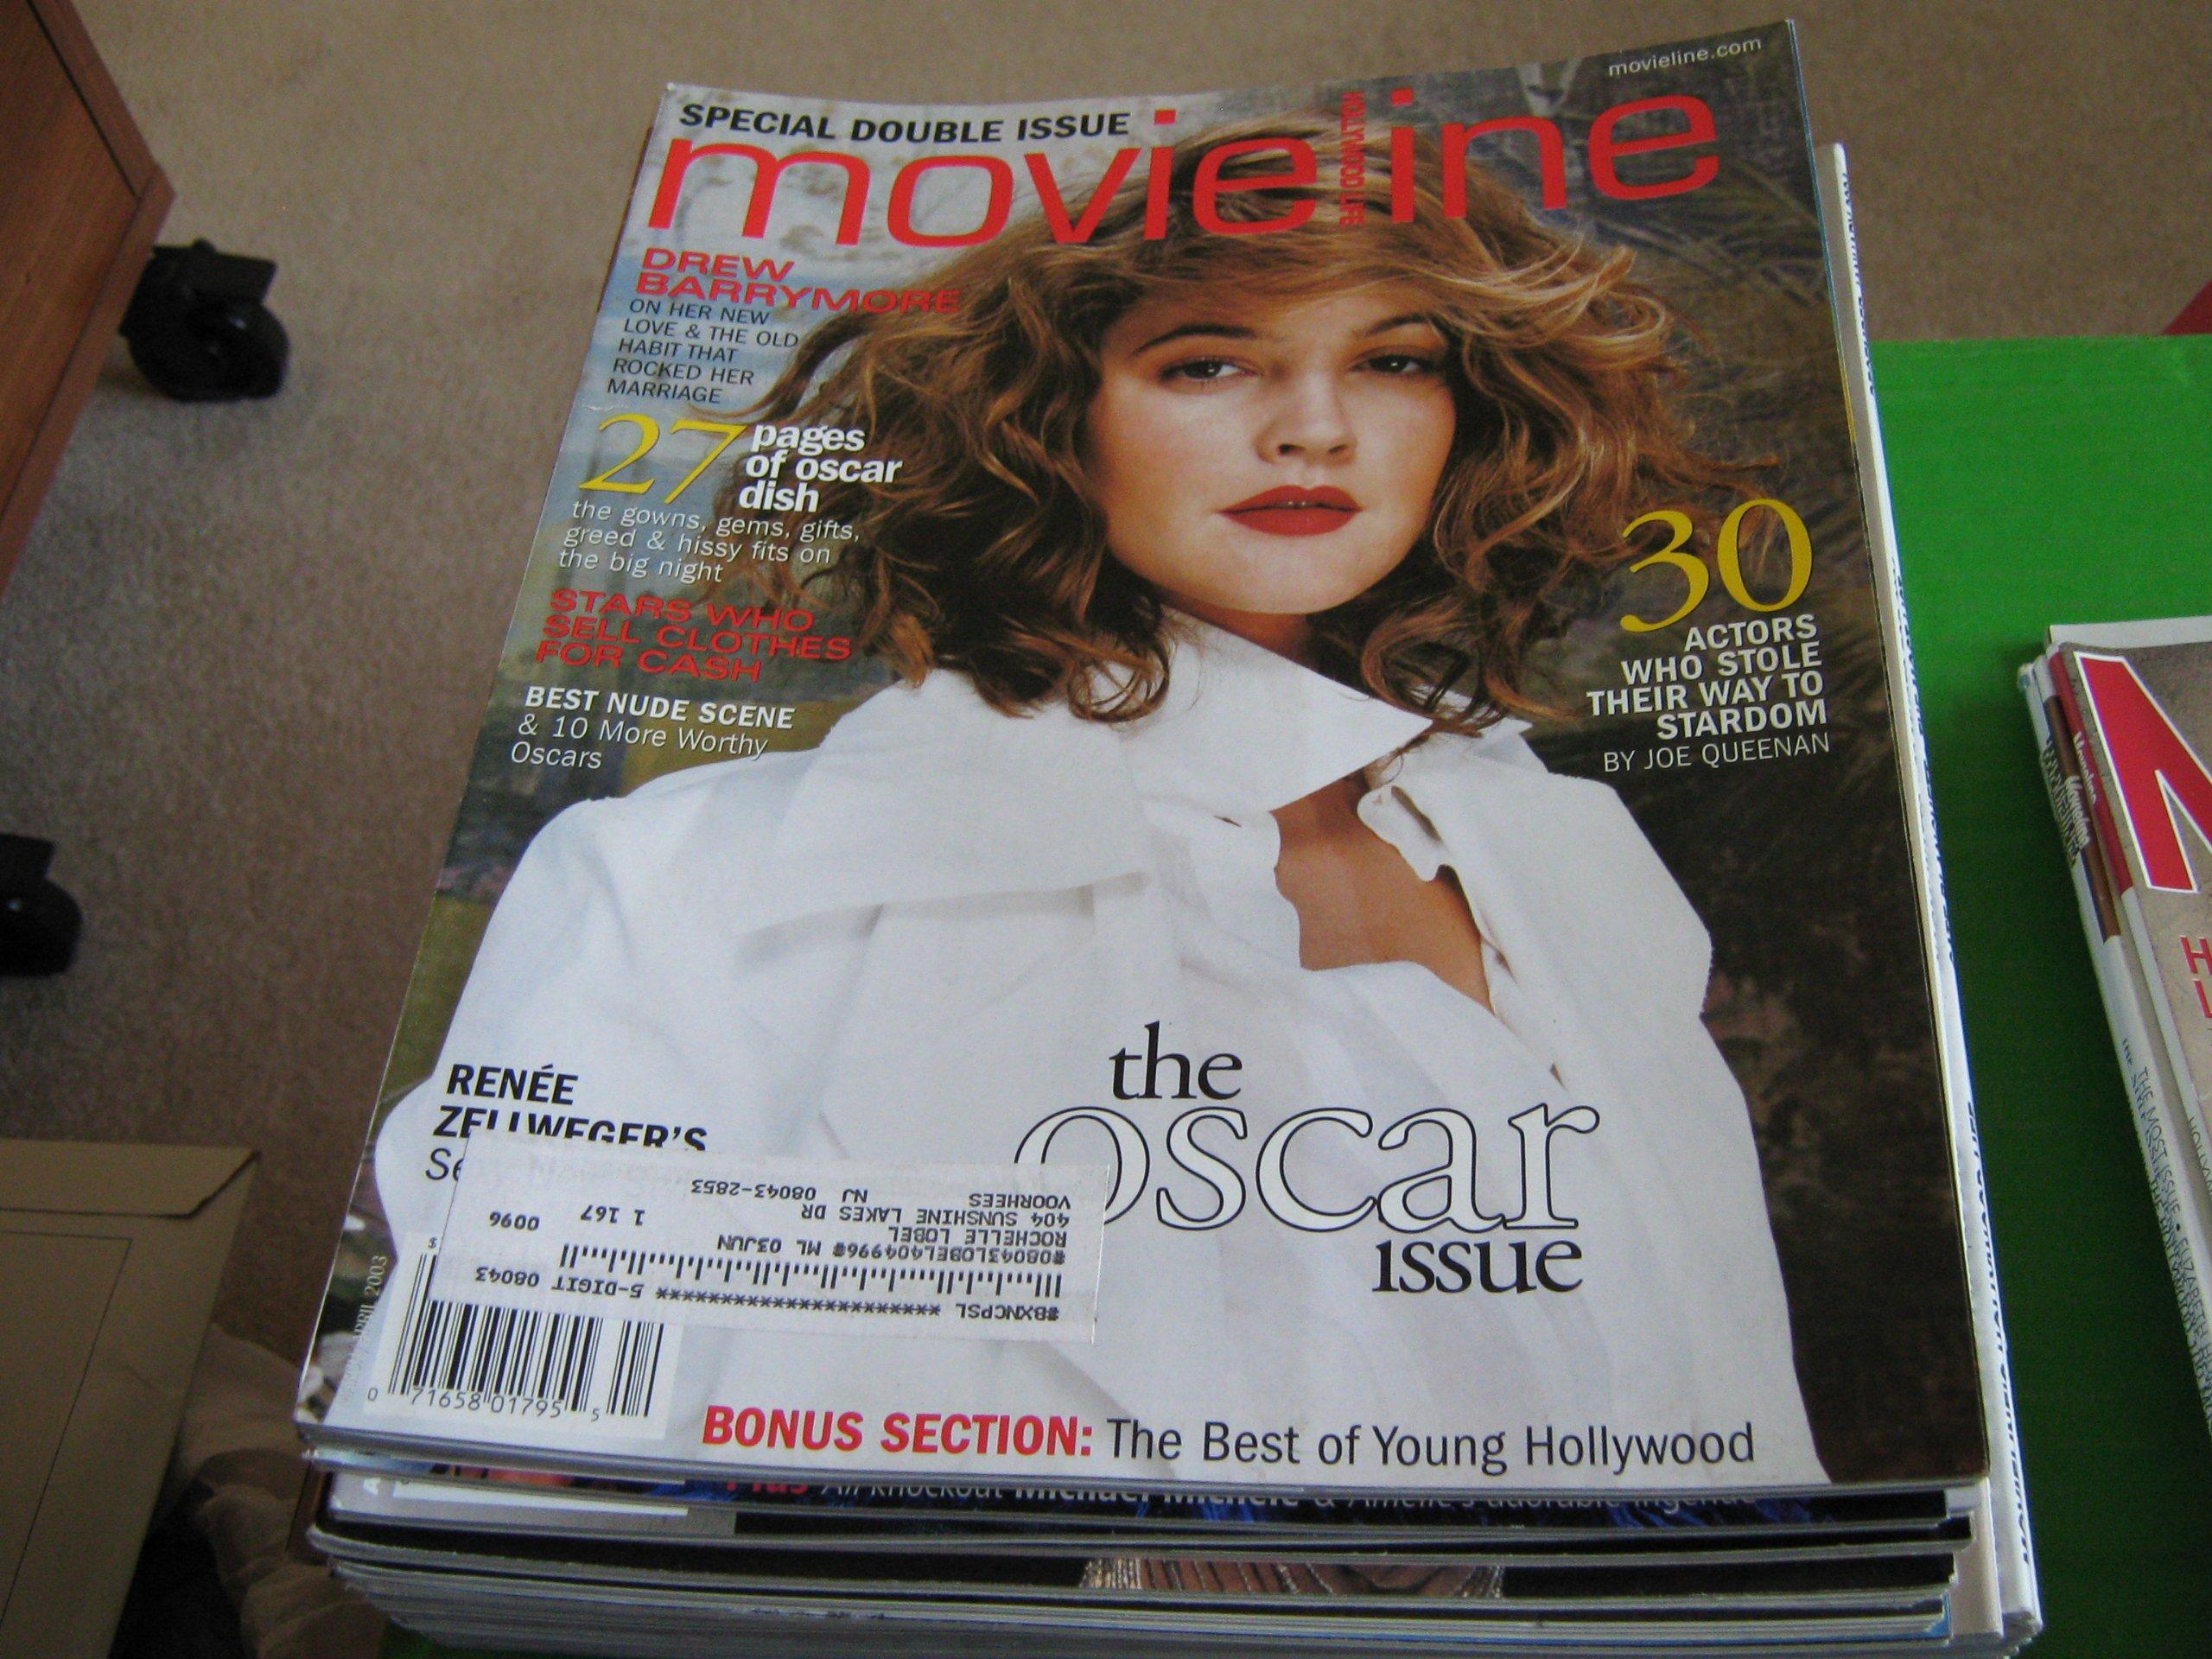 Read Online Movieline Magazine (Drew Barrymore , Best Nude Scene , 27 Pages of Oscar Dish , Renee Zellweger, March / April 2003) ebook